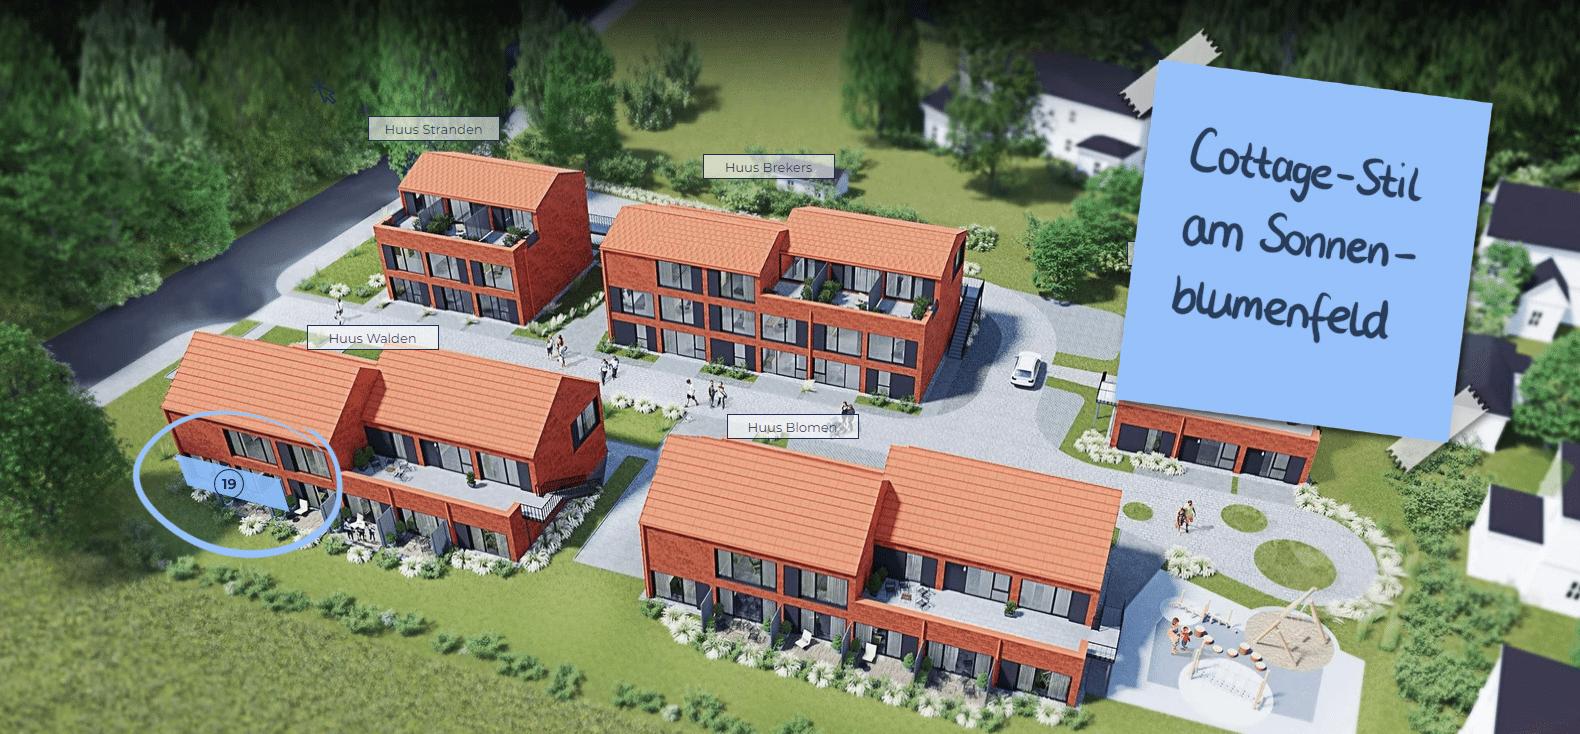 19_De ole School - Ostseeurlaub Ferienapartments Hohwacht Nähe Heiligenhafen Lütjenburg Kieler Bucht